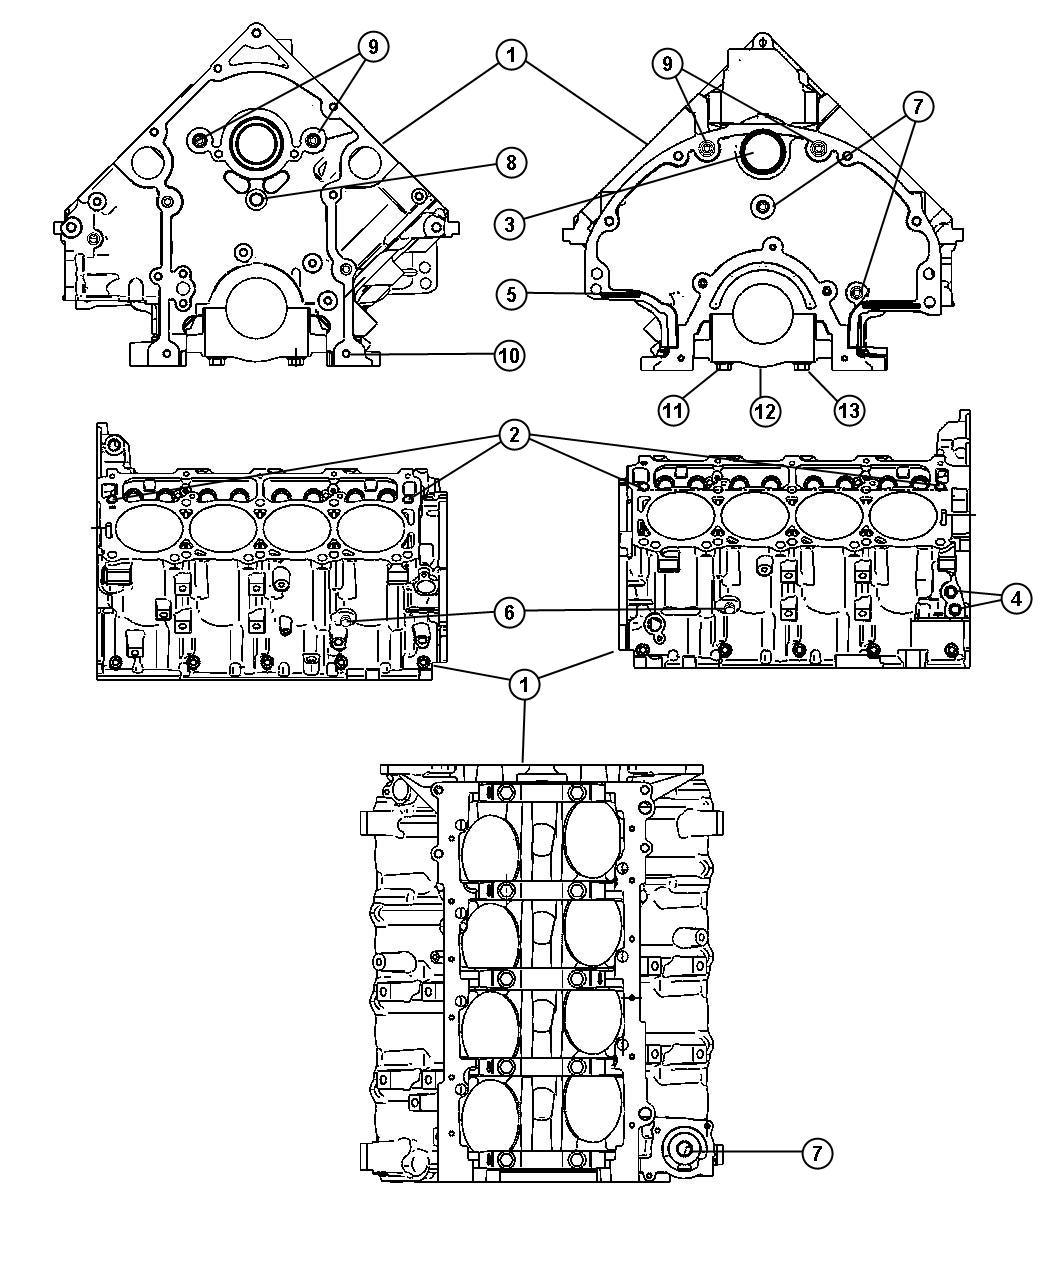 Chrysler Aspen Pin Dowel M8x10 00 Front Cover To Block